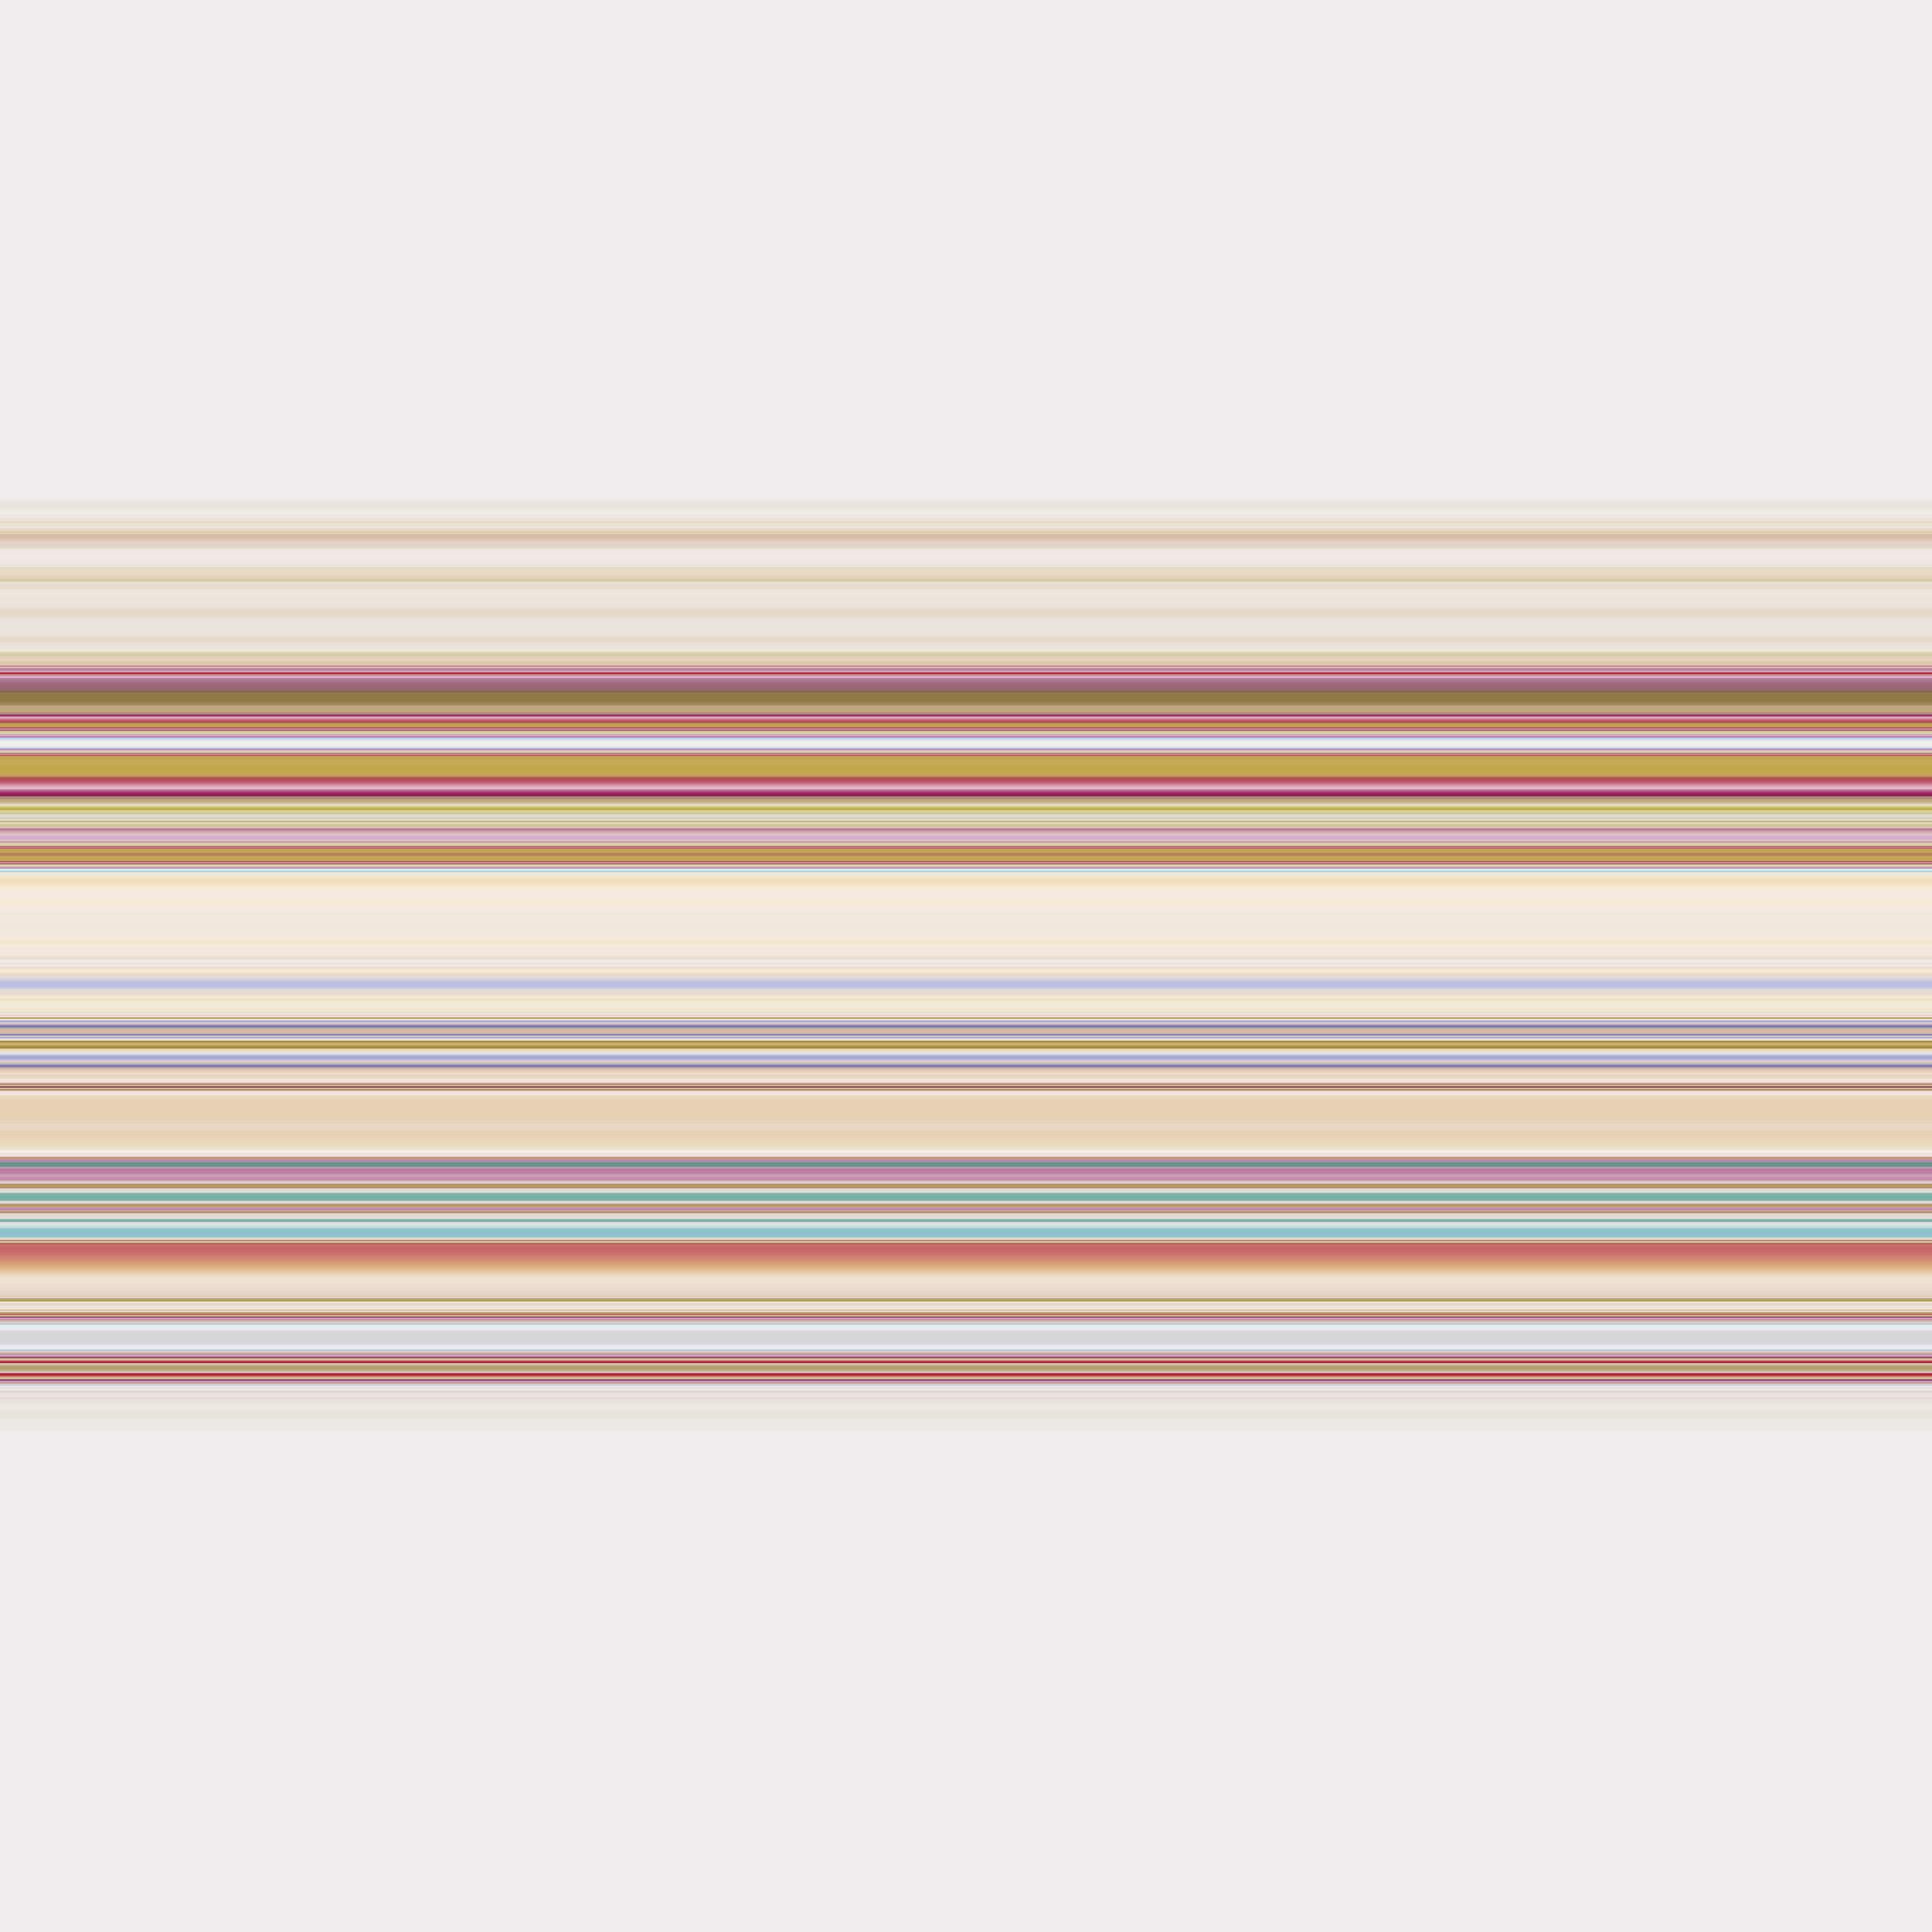 PAUL SNELL  Mute # 201705  2018 Lambda Print Face-mounted to 3mm plexiglas 100 ×100 cm